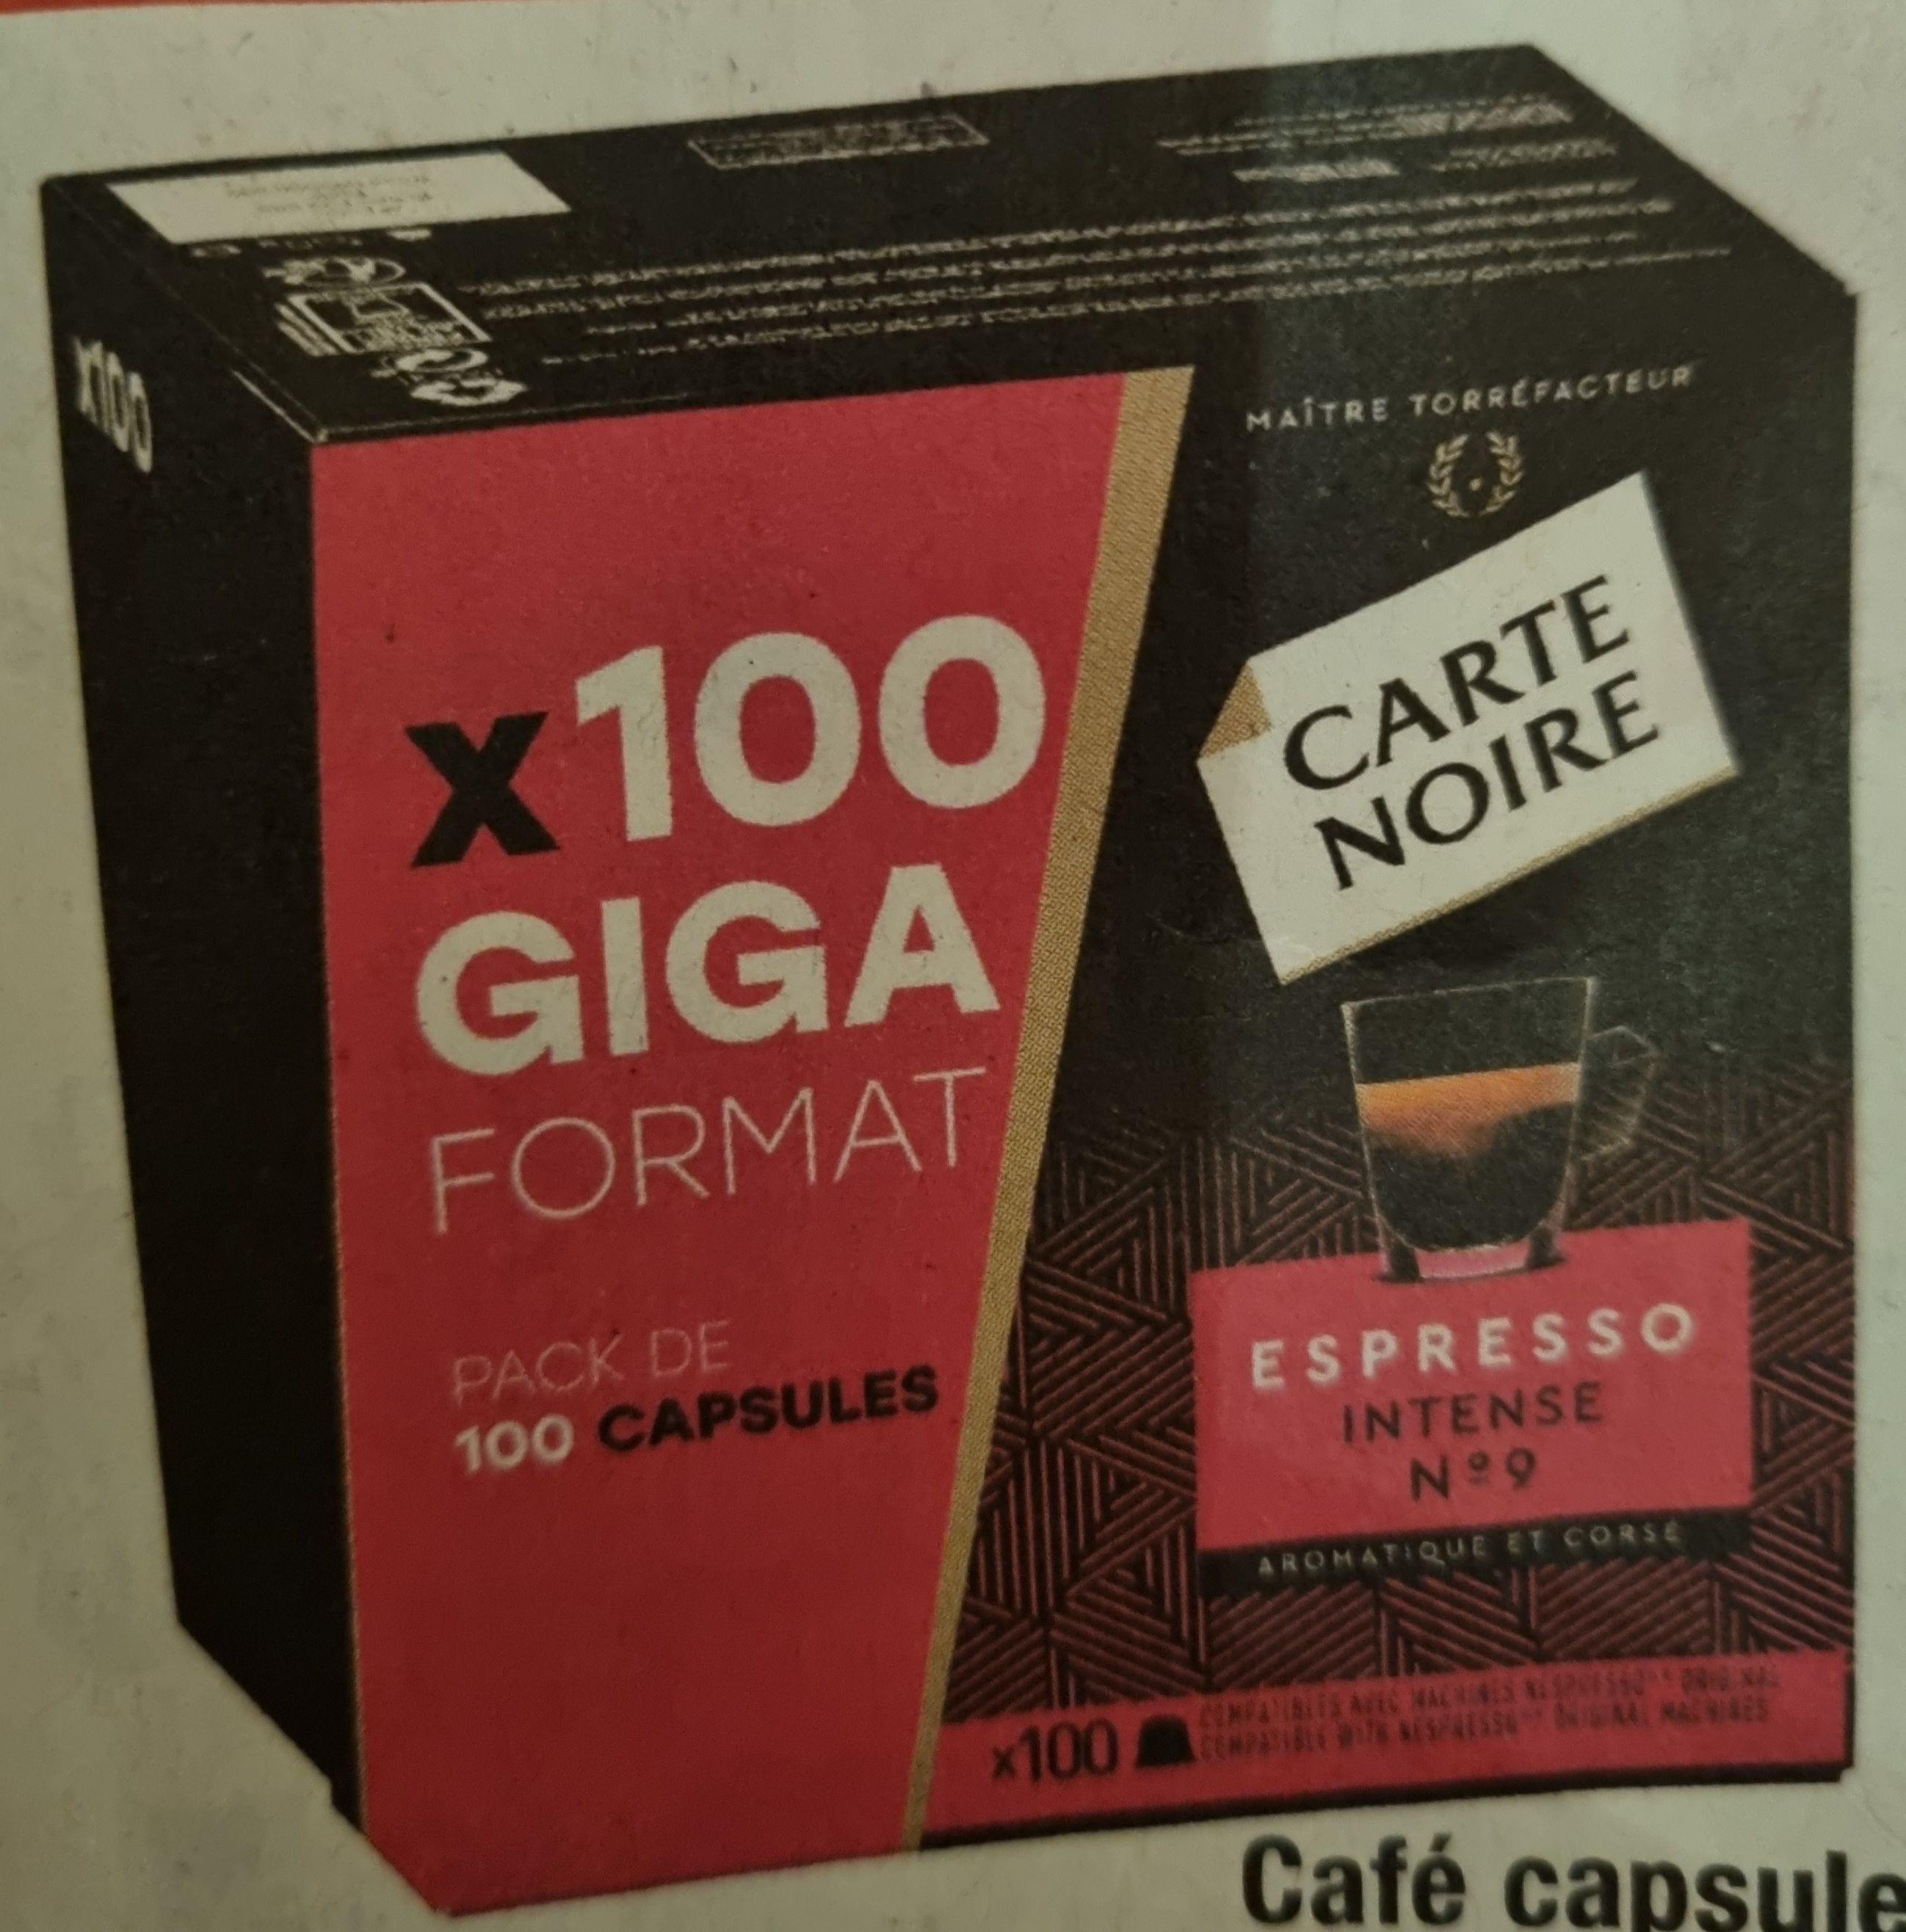 Boîte de 100 capsules de café Carte noire compatible Nespresso (Espresso intense n°9 ou Lungo classic n°6)